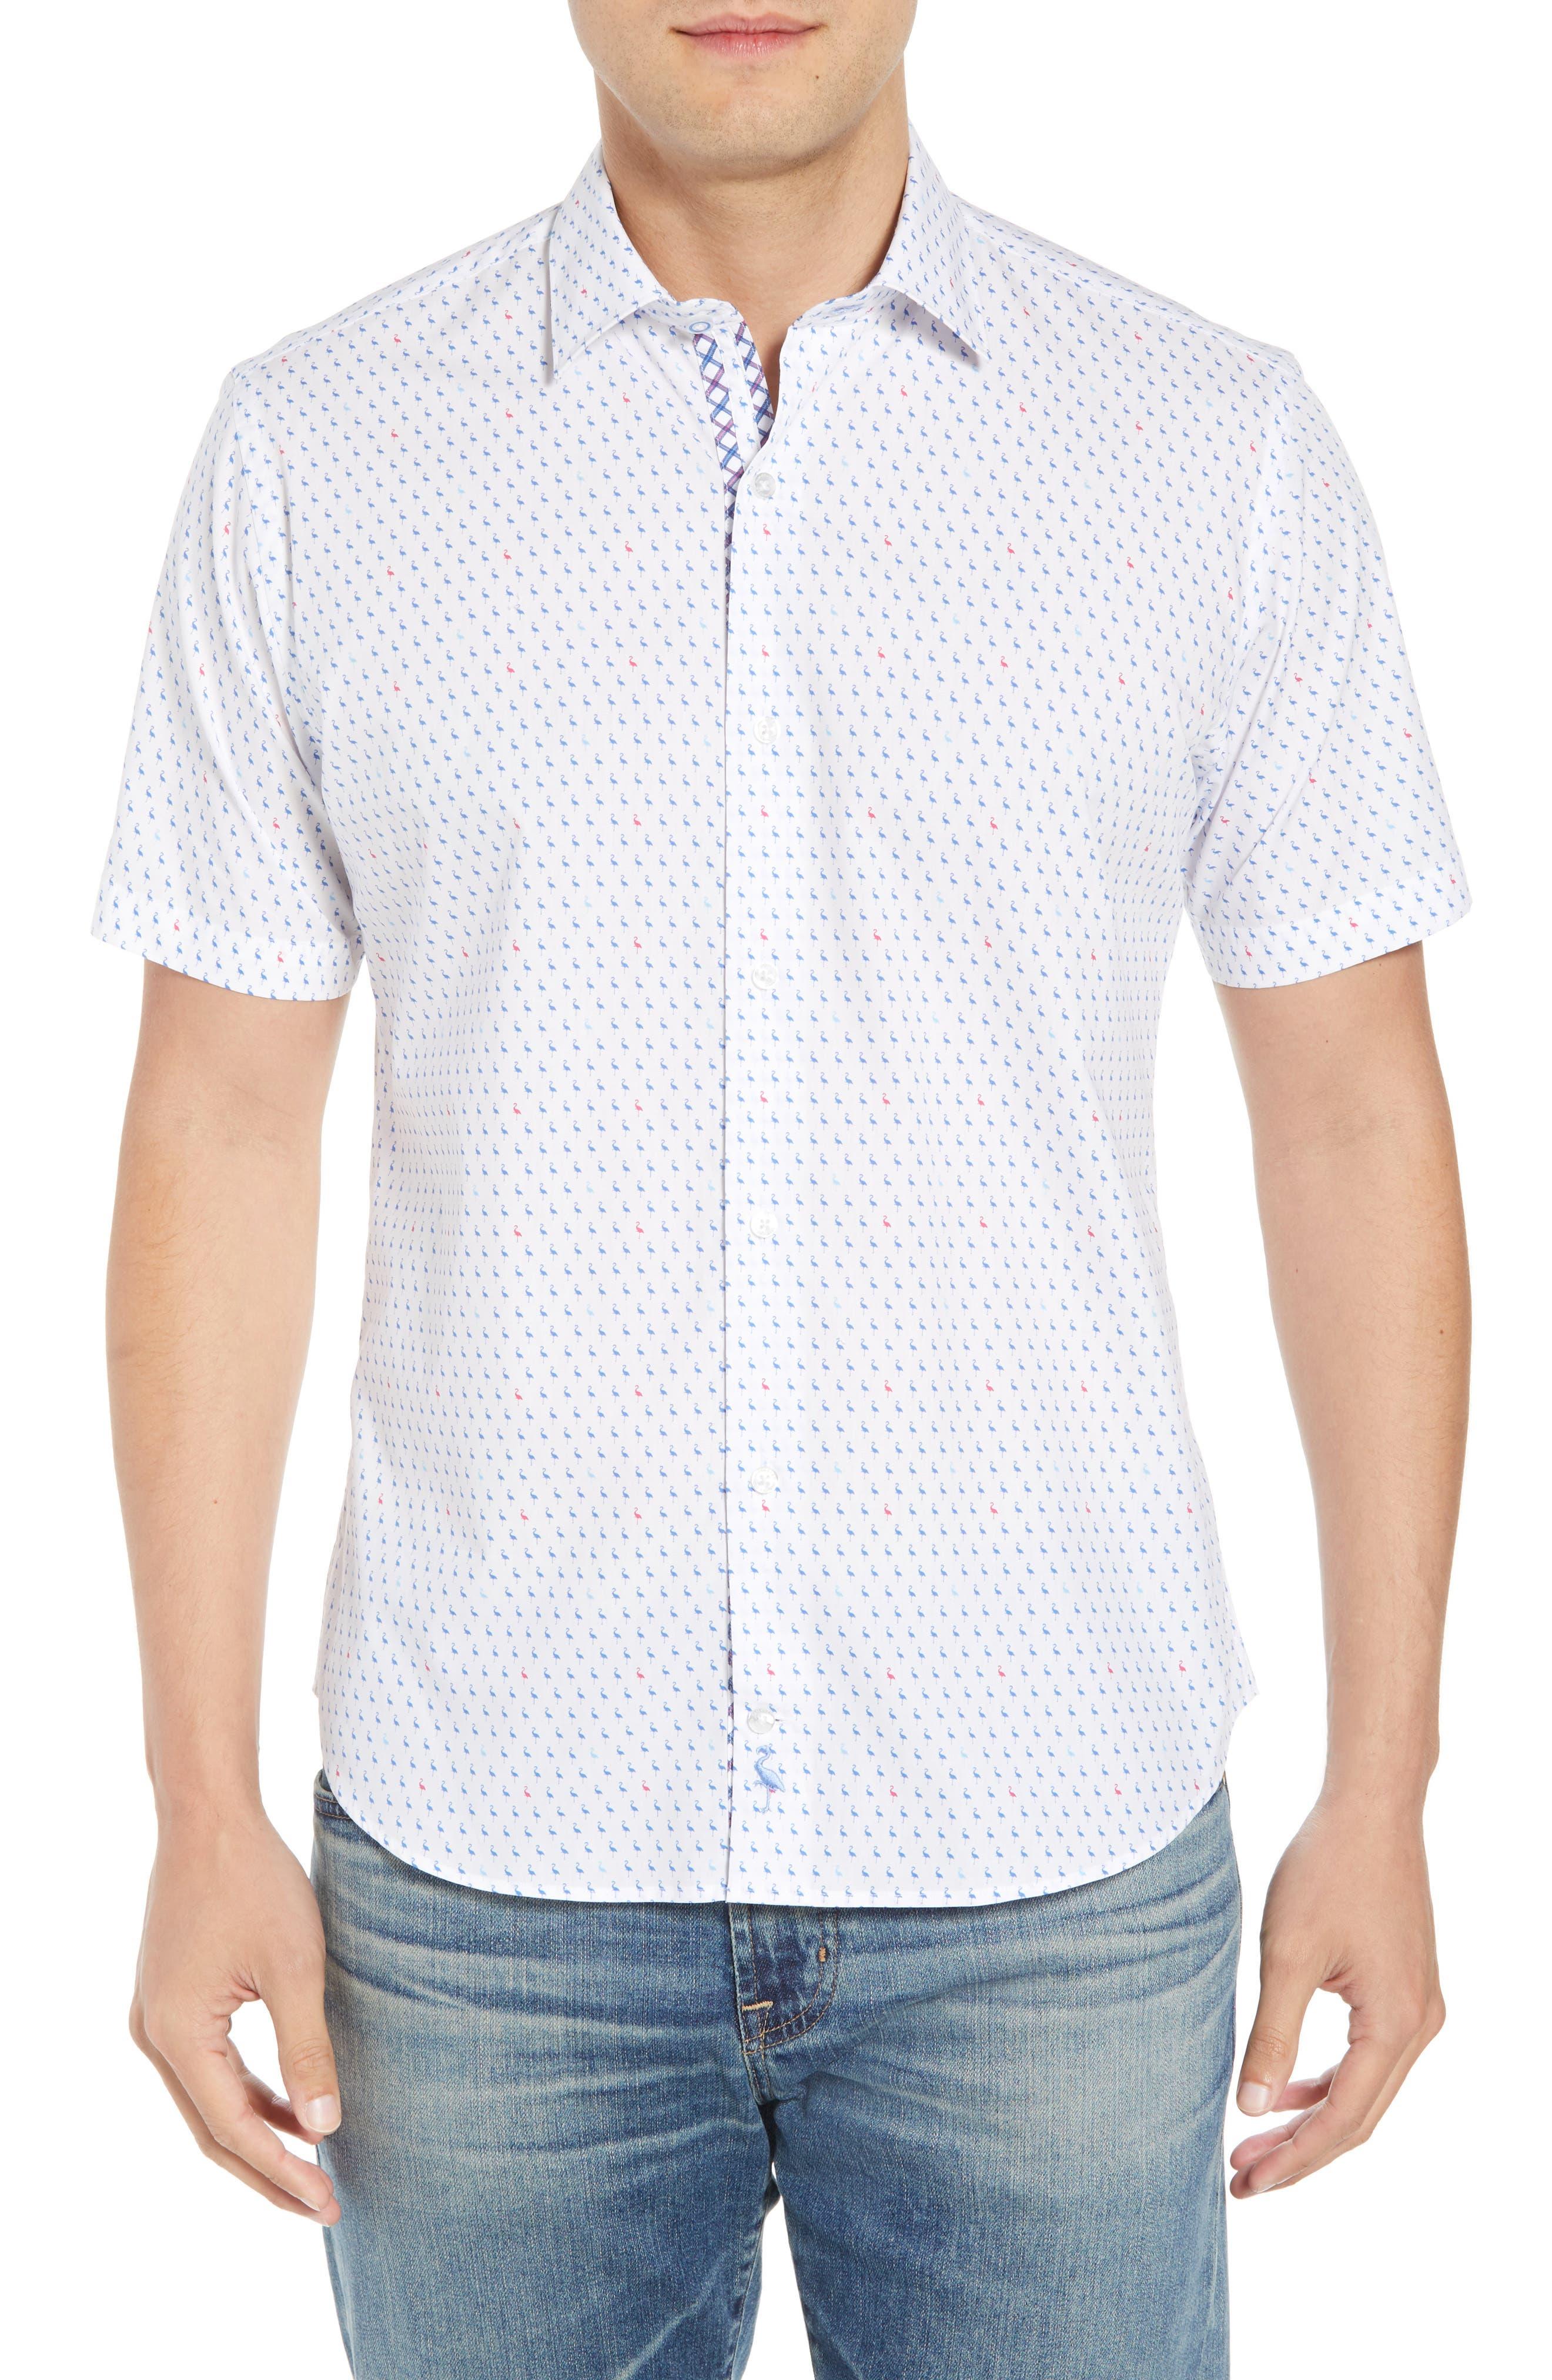 Arrie Regular Fit Print Sport Shirt,                         Main,                         color, Peri Blue